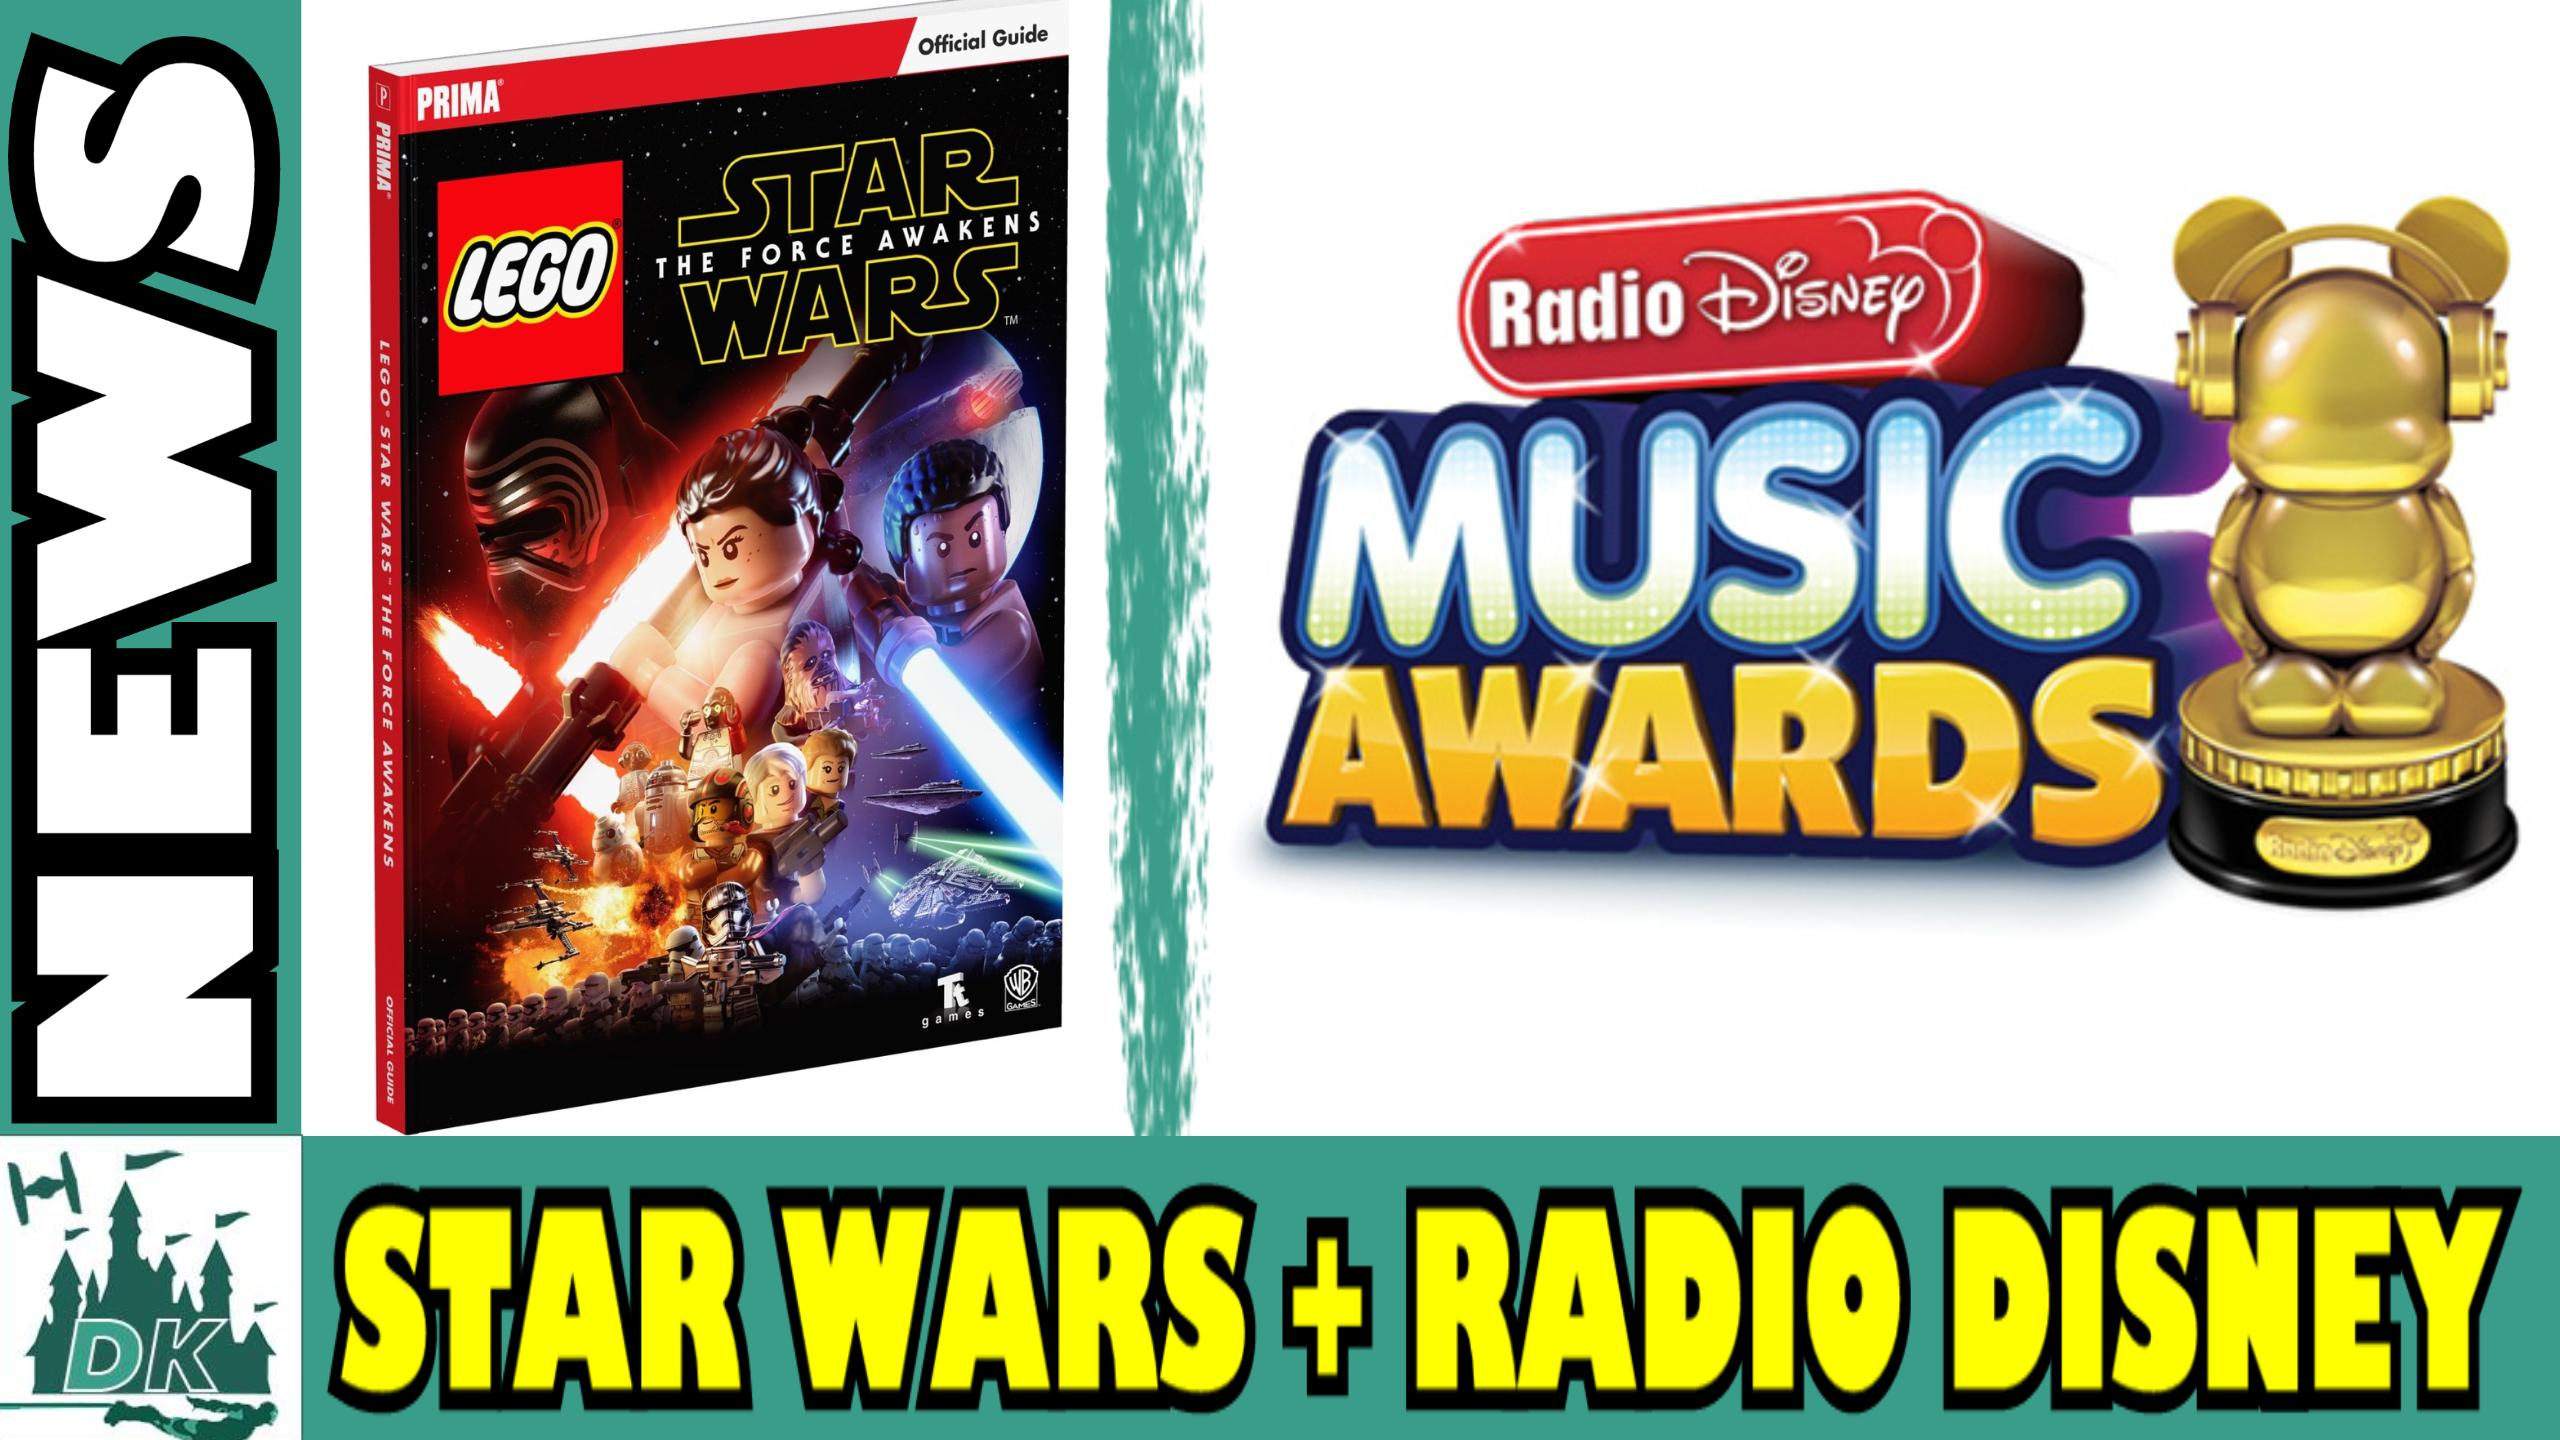 Radio Disney Awards + LEGO Star Wars Guide Book | News